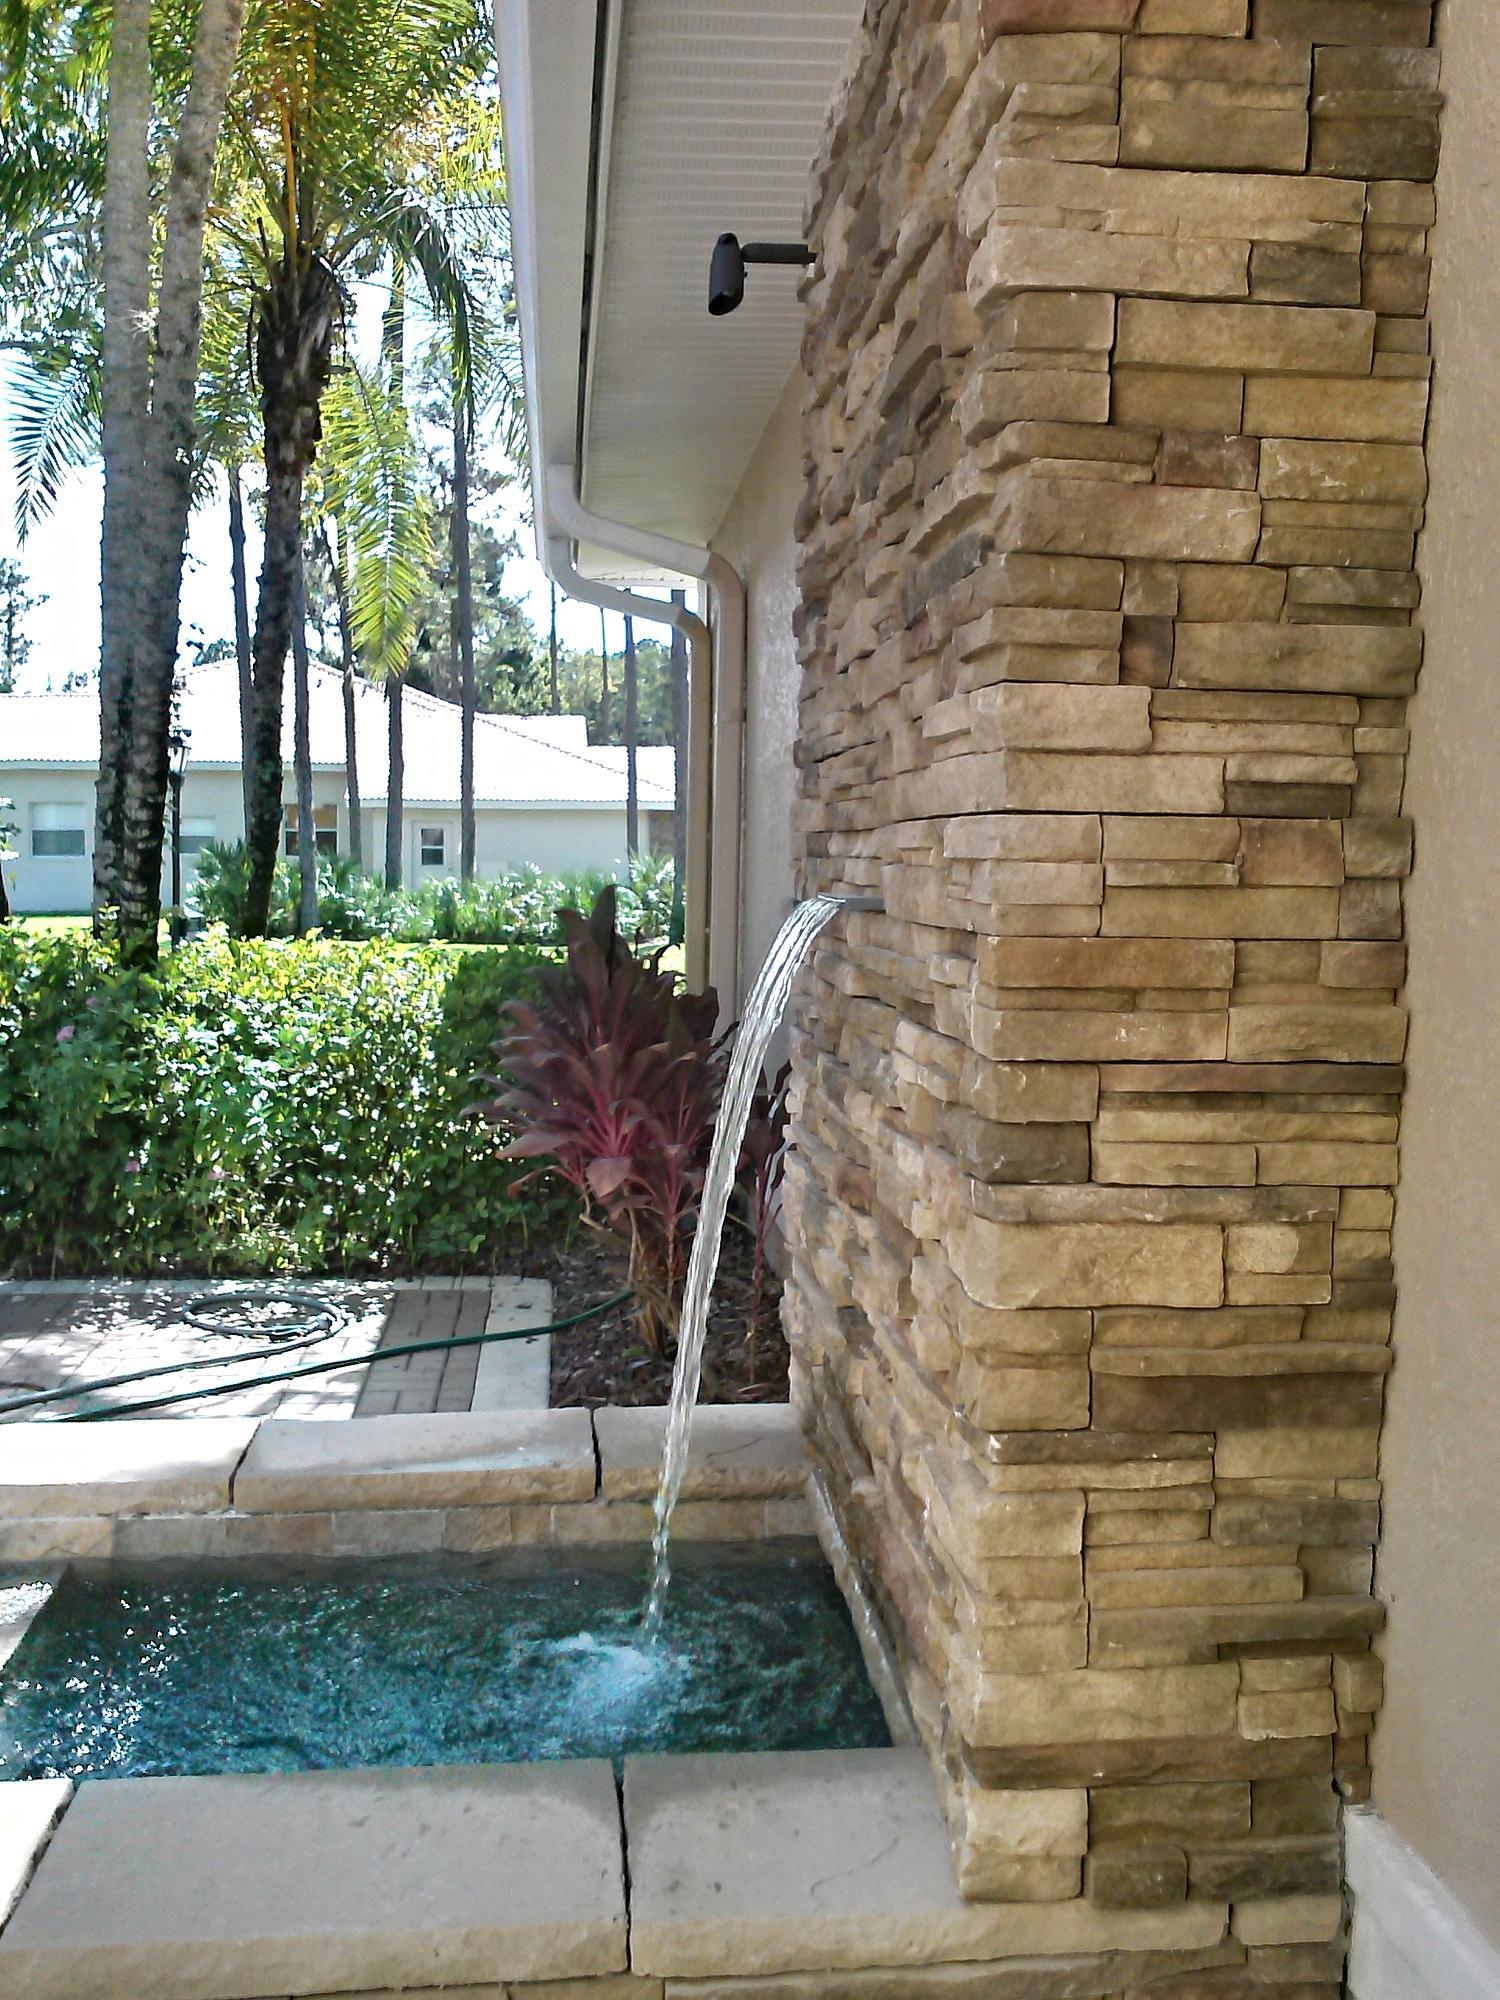 Clark Outdoor Kitchen & Water Feature - Fountain